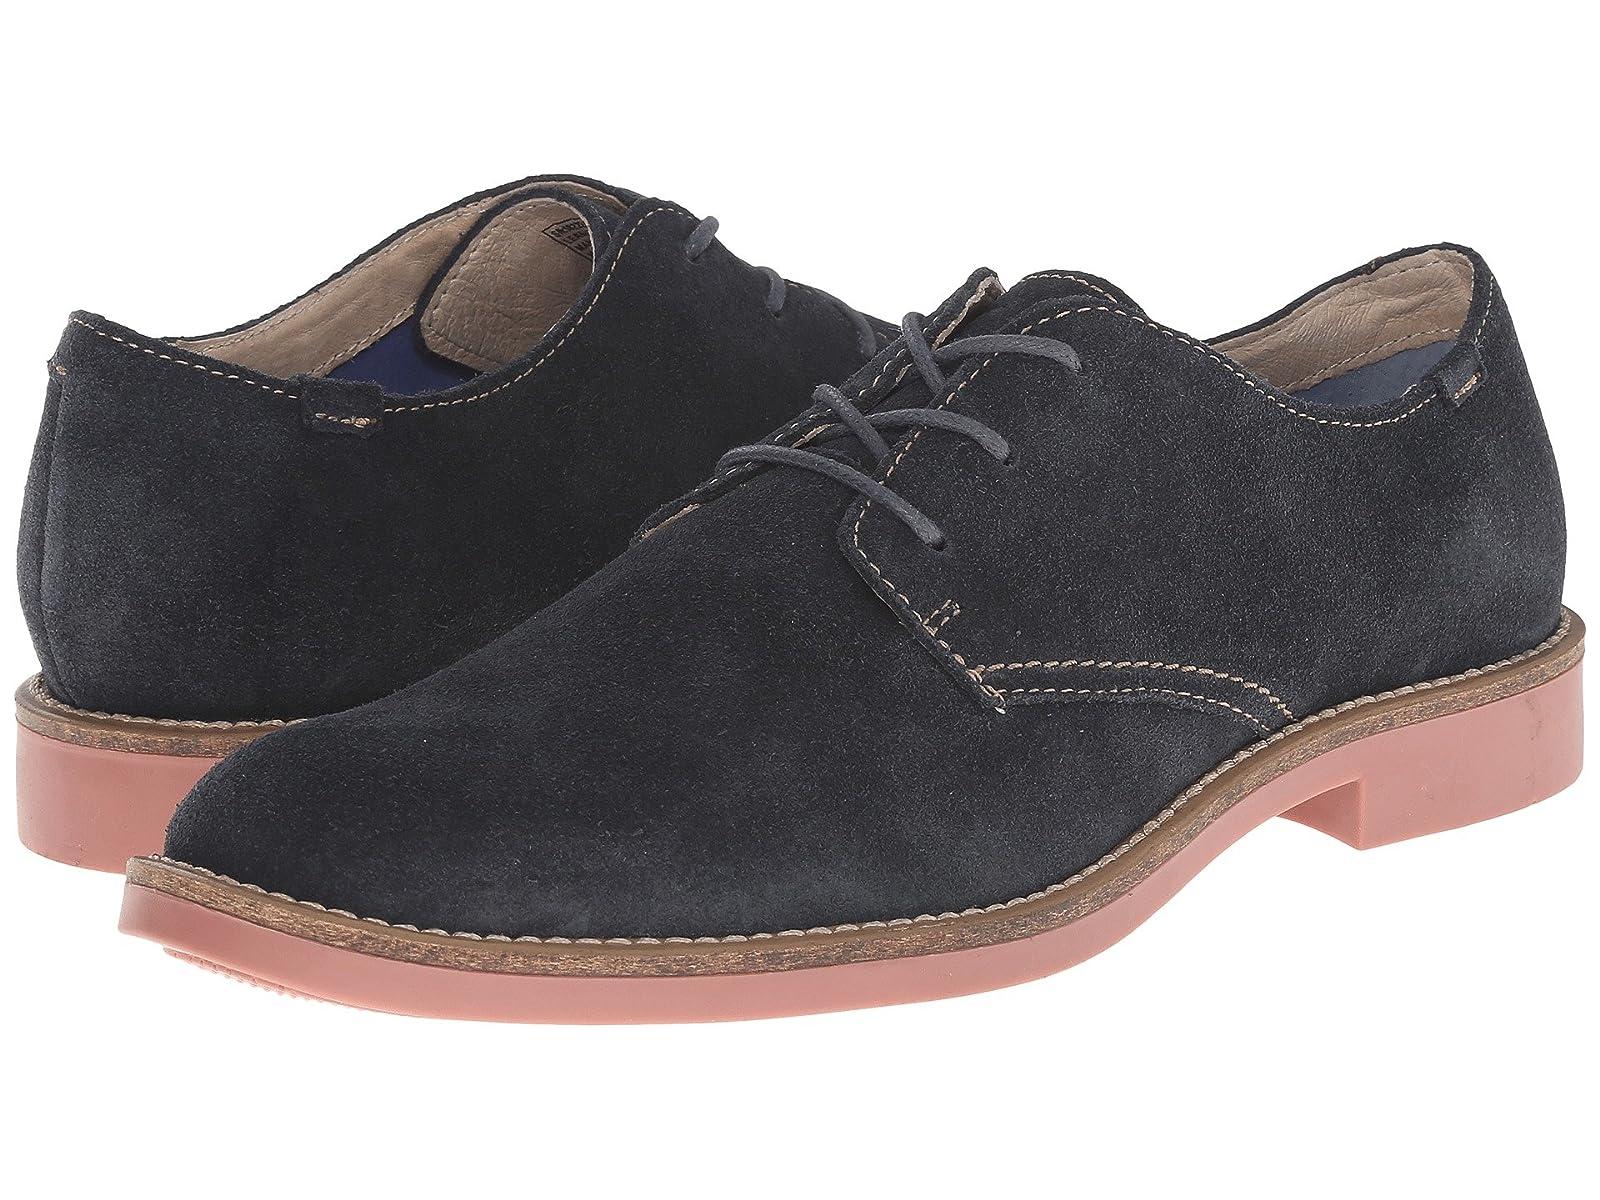 Mark Nason ColeyCheap and distinctive eye-catching shoes